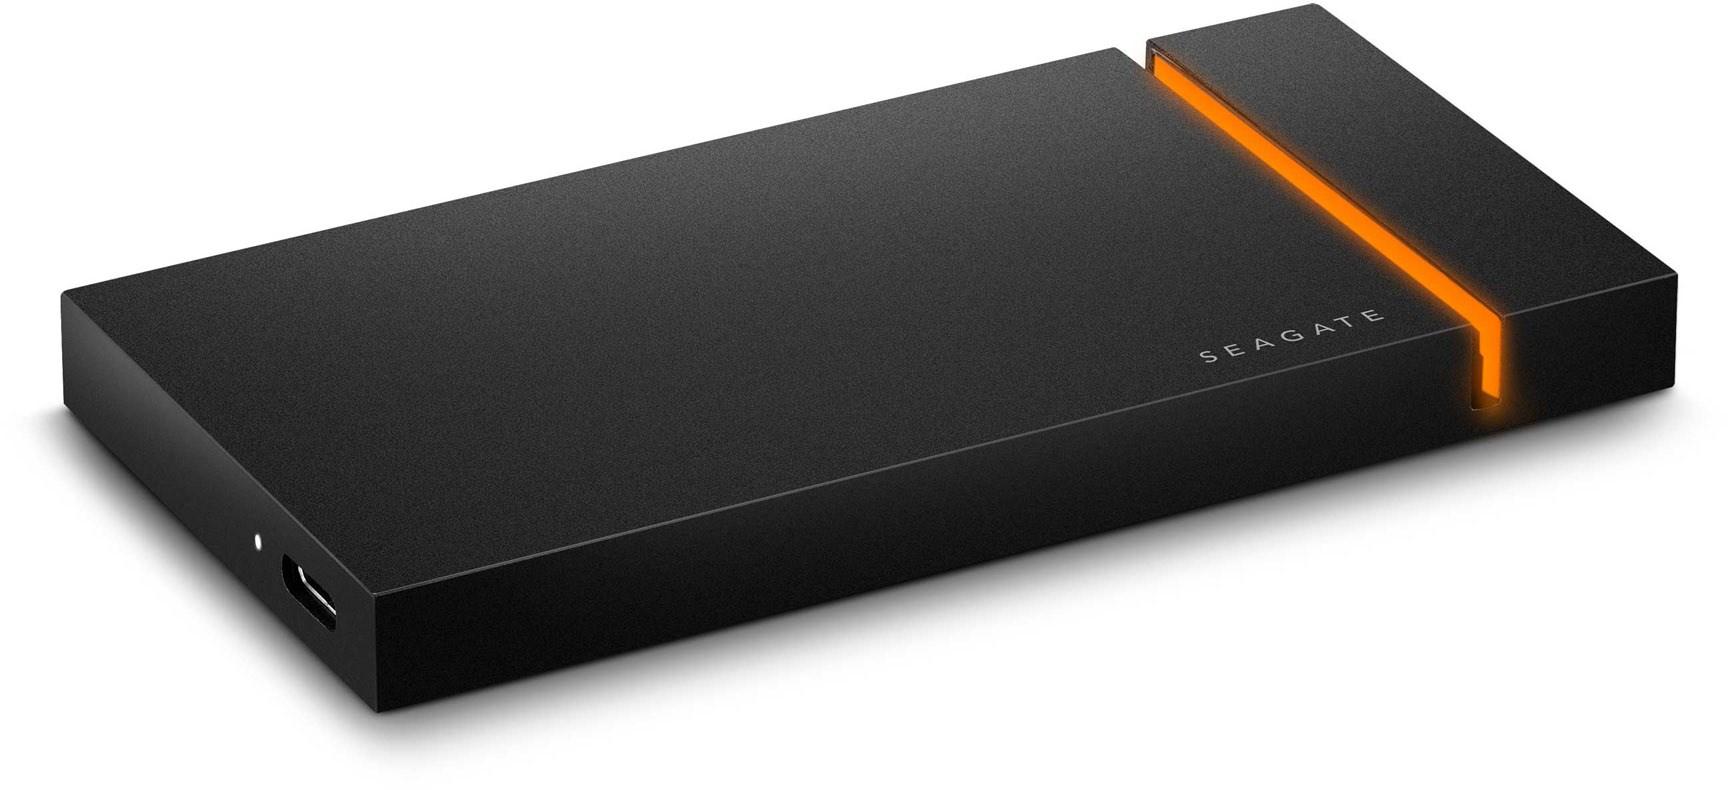 Seagate Firecuda Gaming SSD 1 TB Externe SSD schwarz